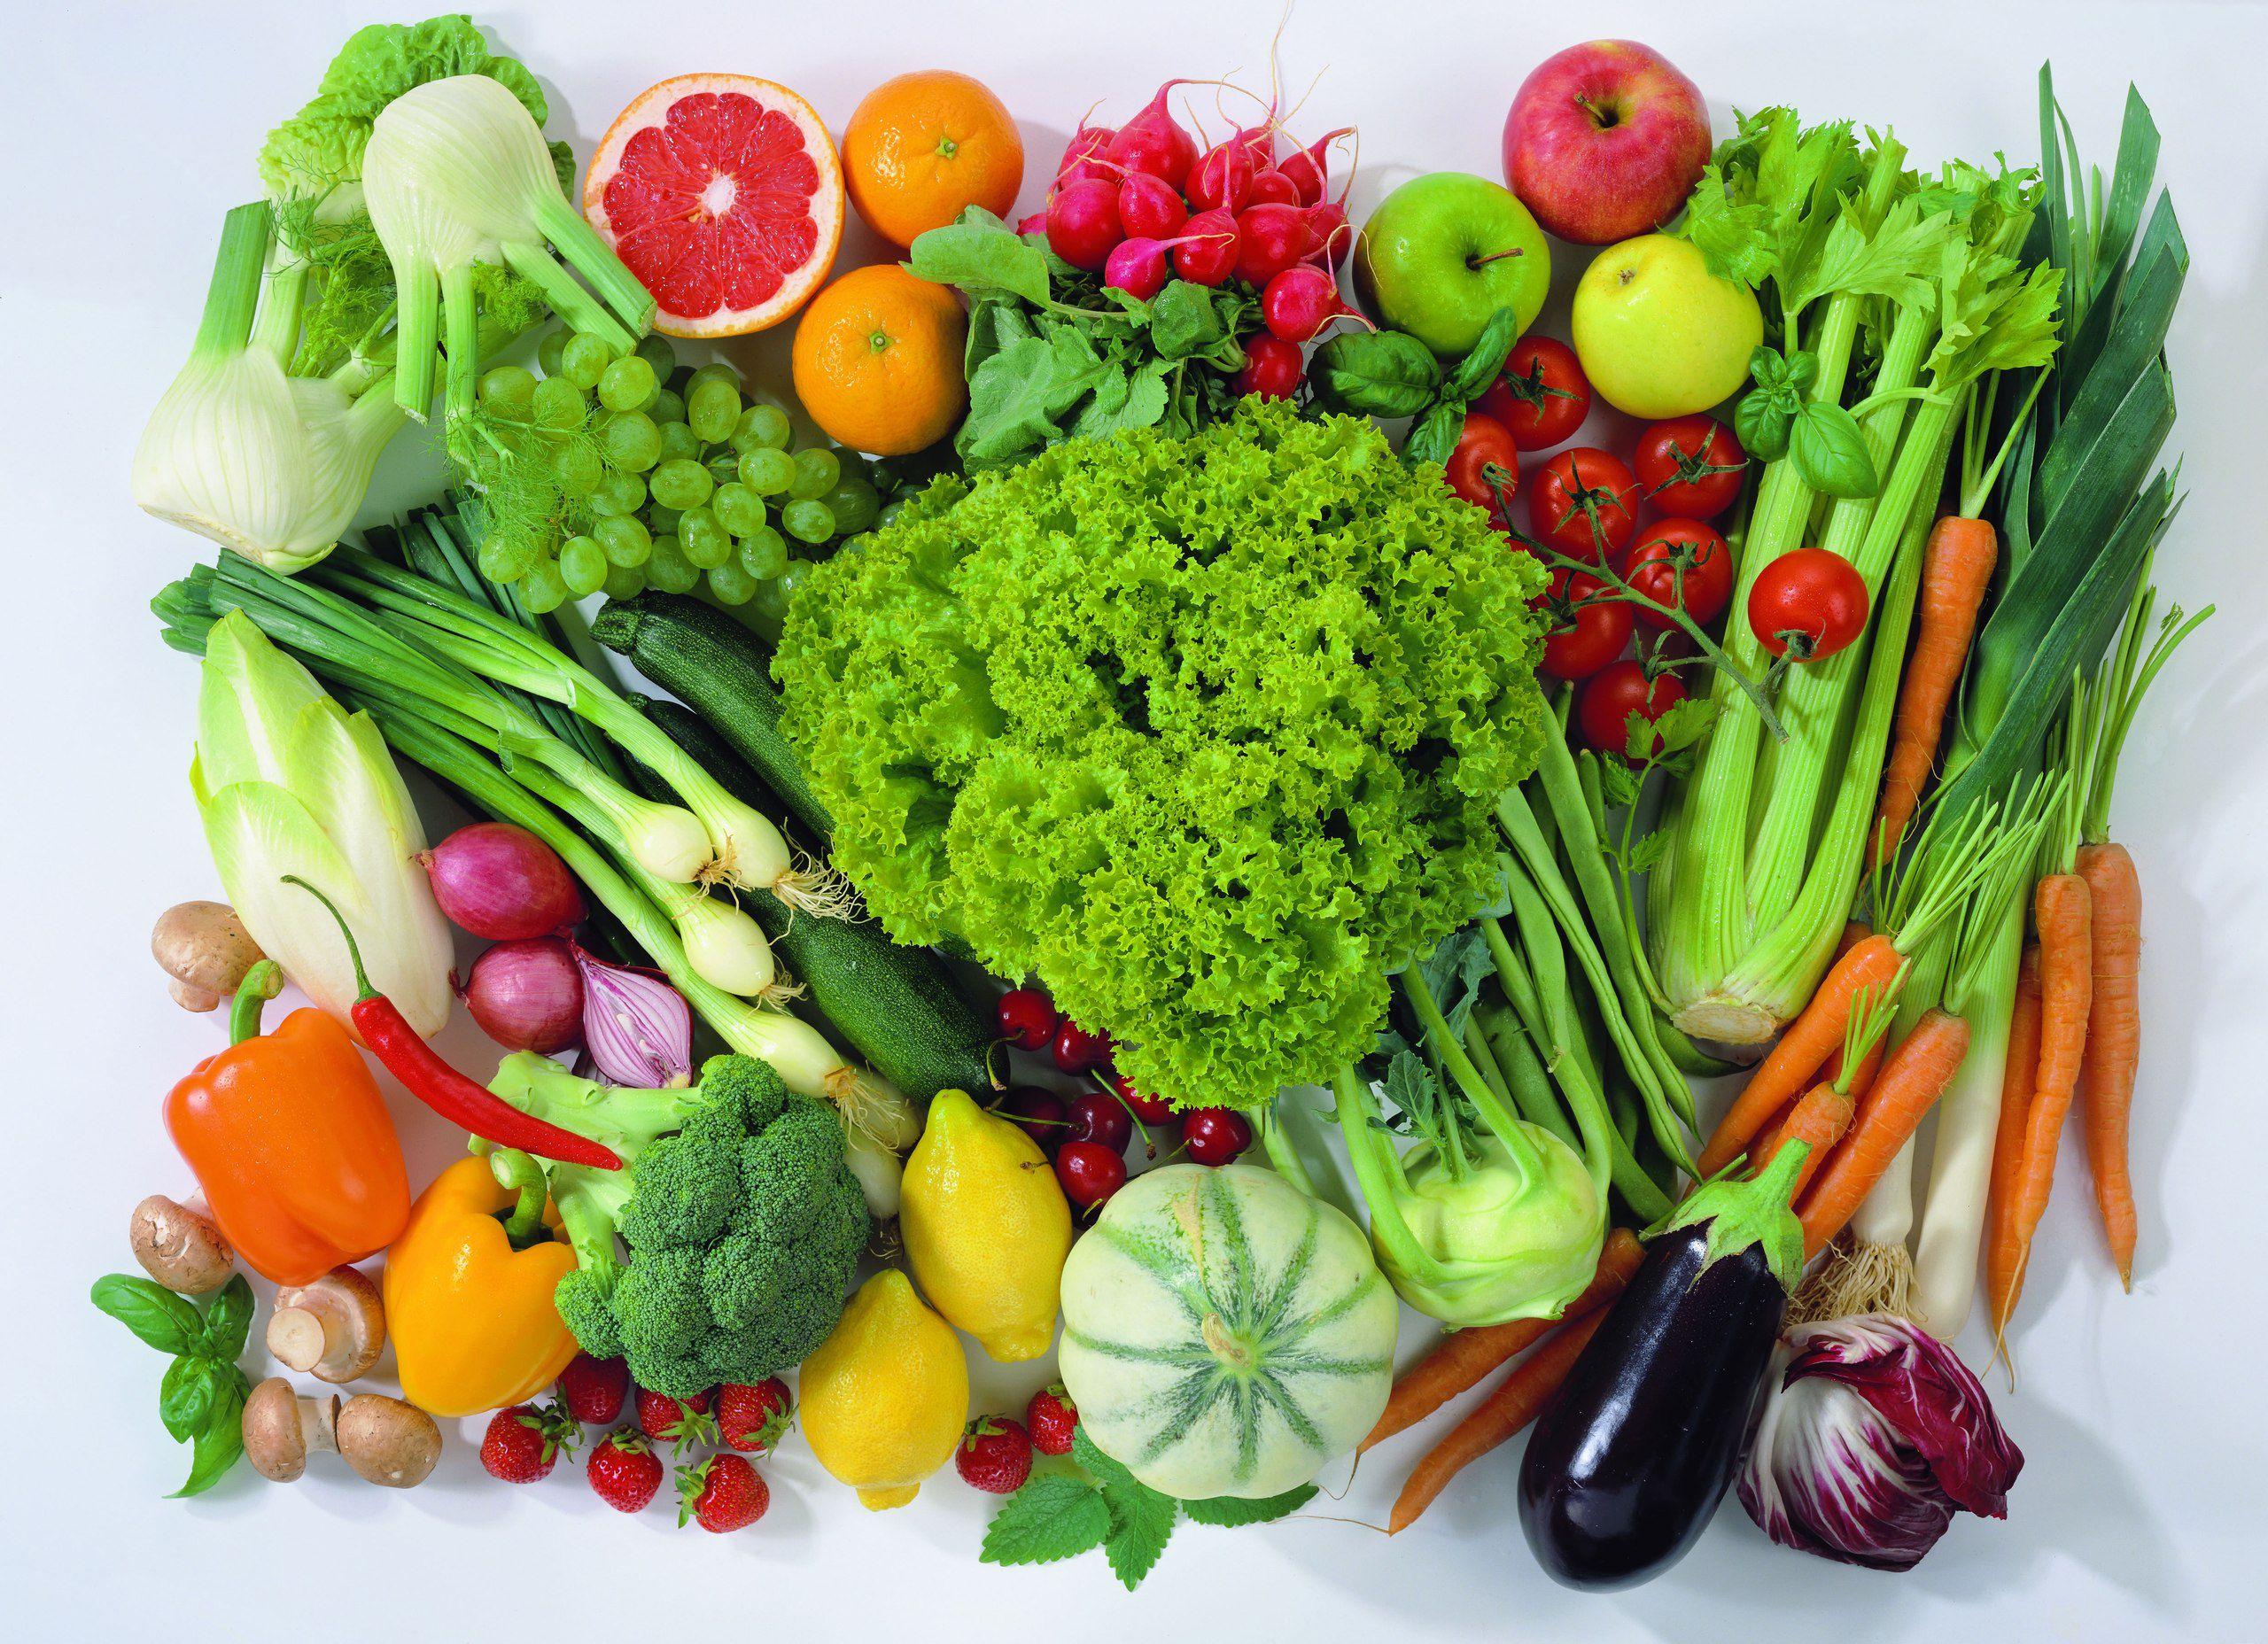 Nima fotovat shandiz natural foods 99